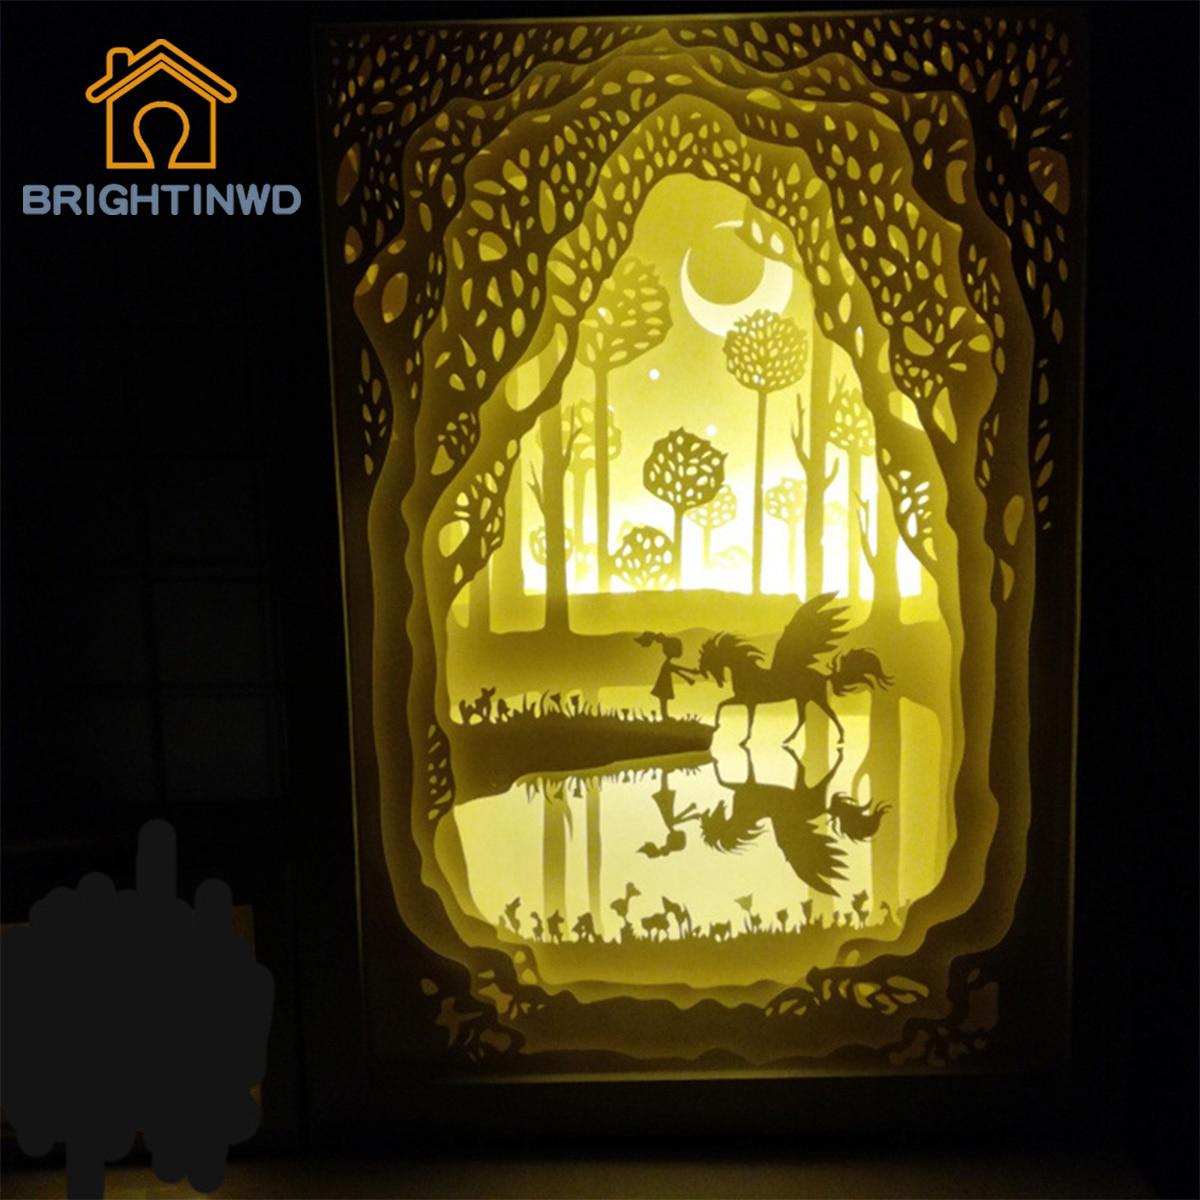 brightinwd conduziu a luz e a lampada de papel da sombra encontram a luz da noite